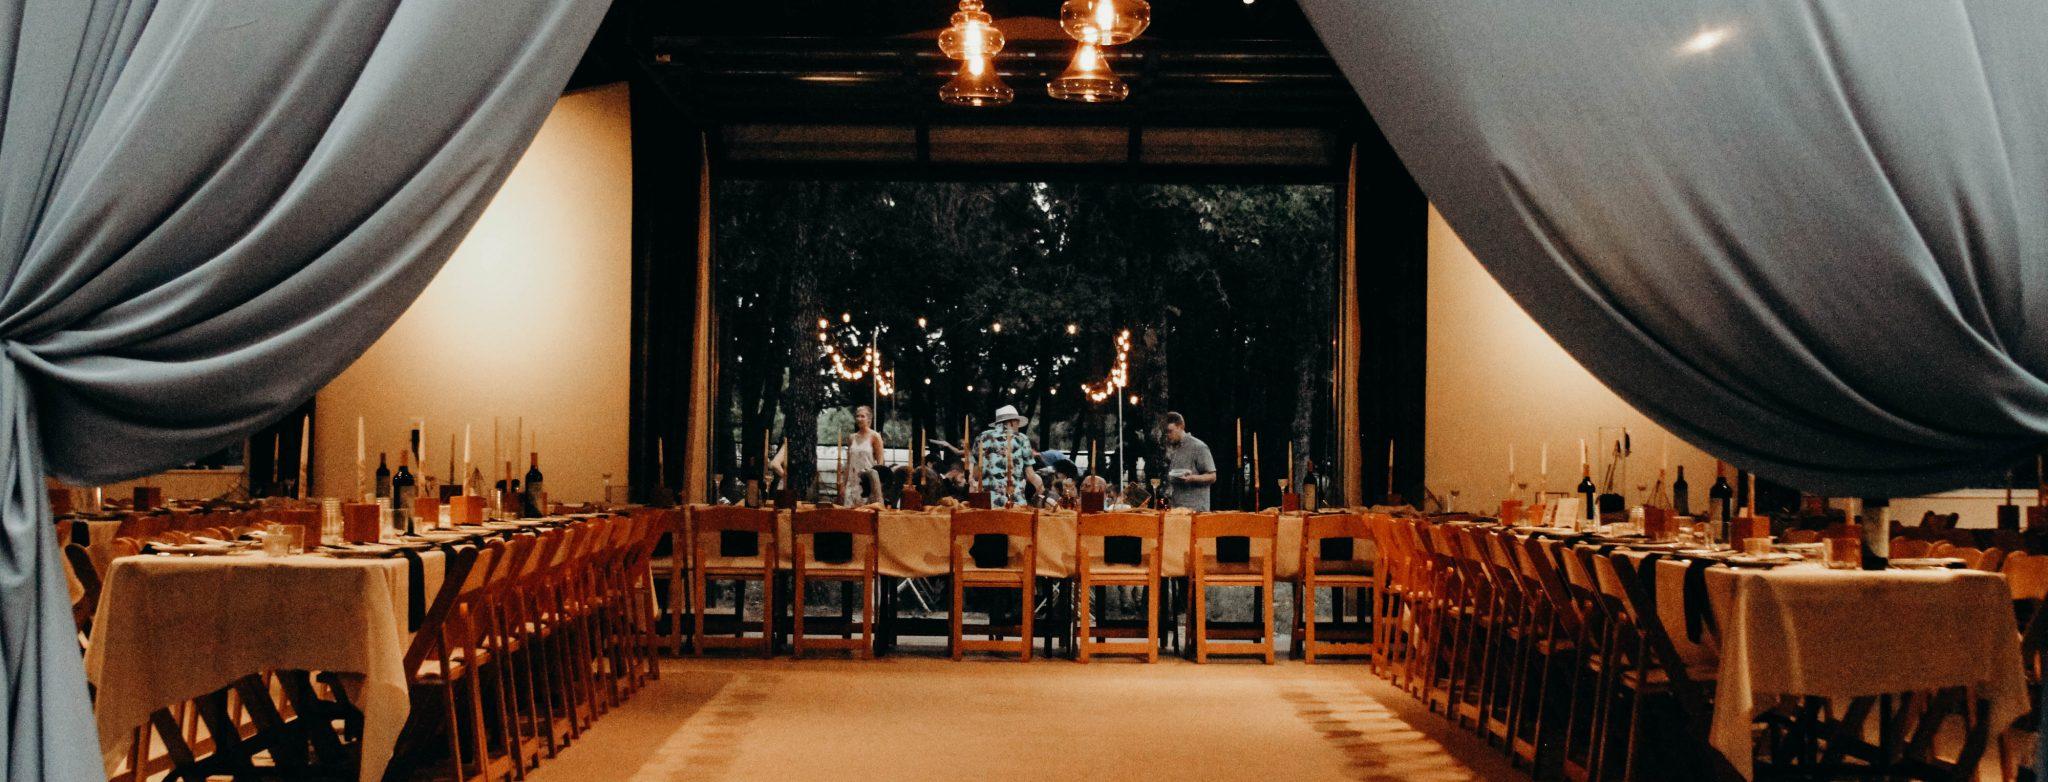 Rustic Barn wedding venue in DFW Texas